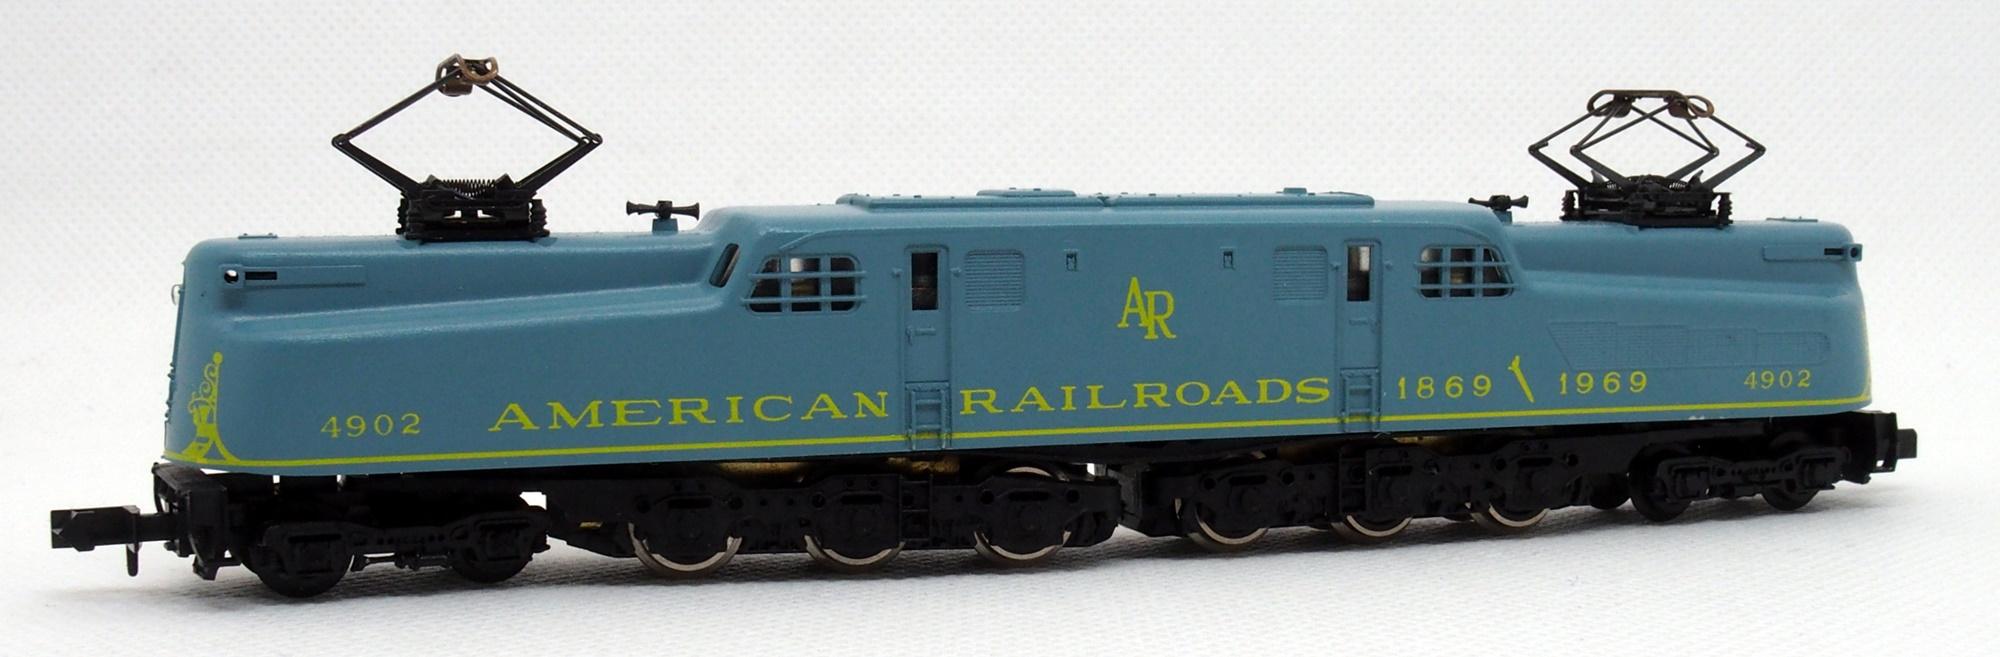 N Scale - Arnold - 5134 - Locomotive, Electric, GG1 - American Railroads (Rivarossi) - 4902